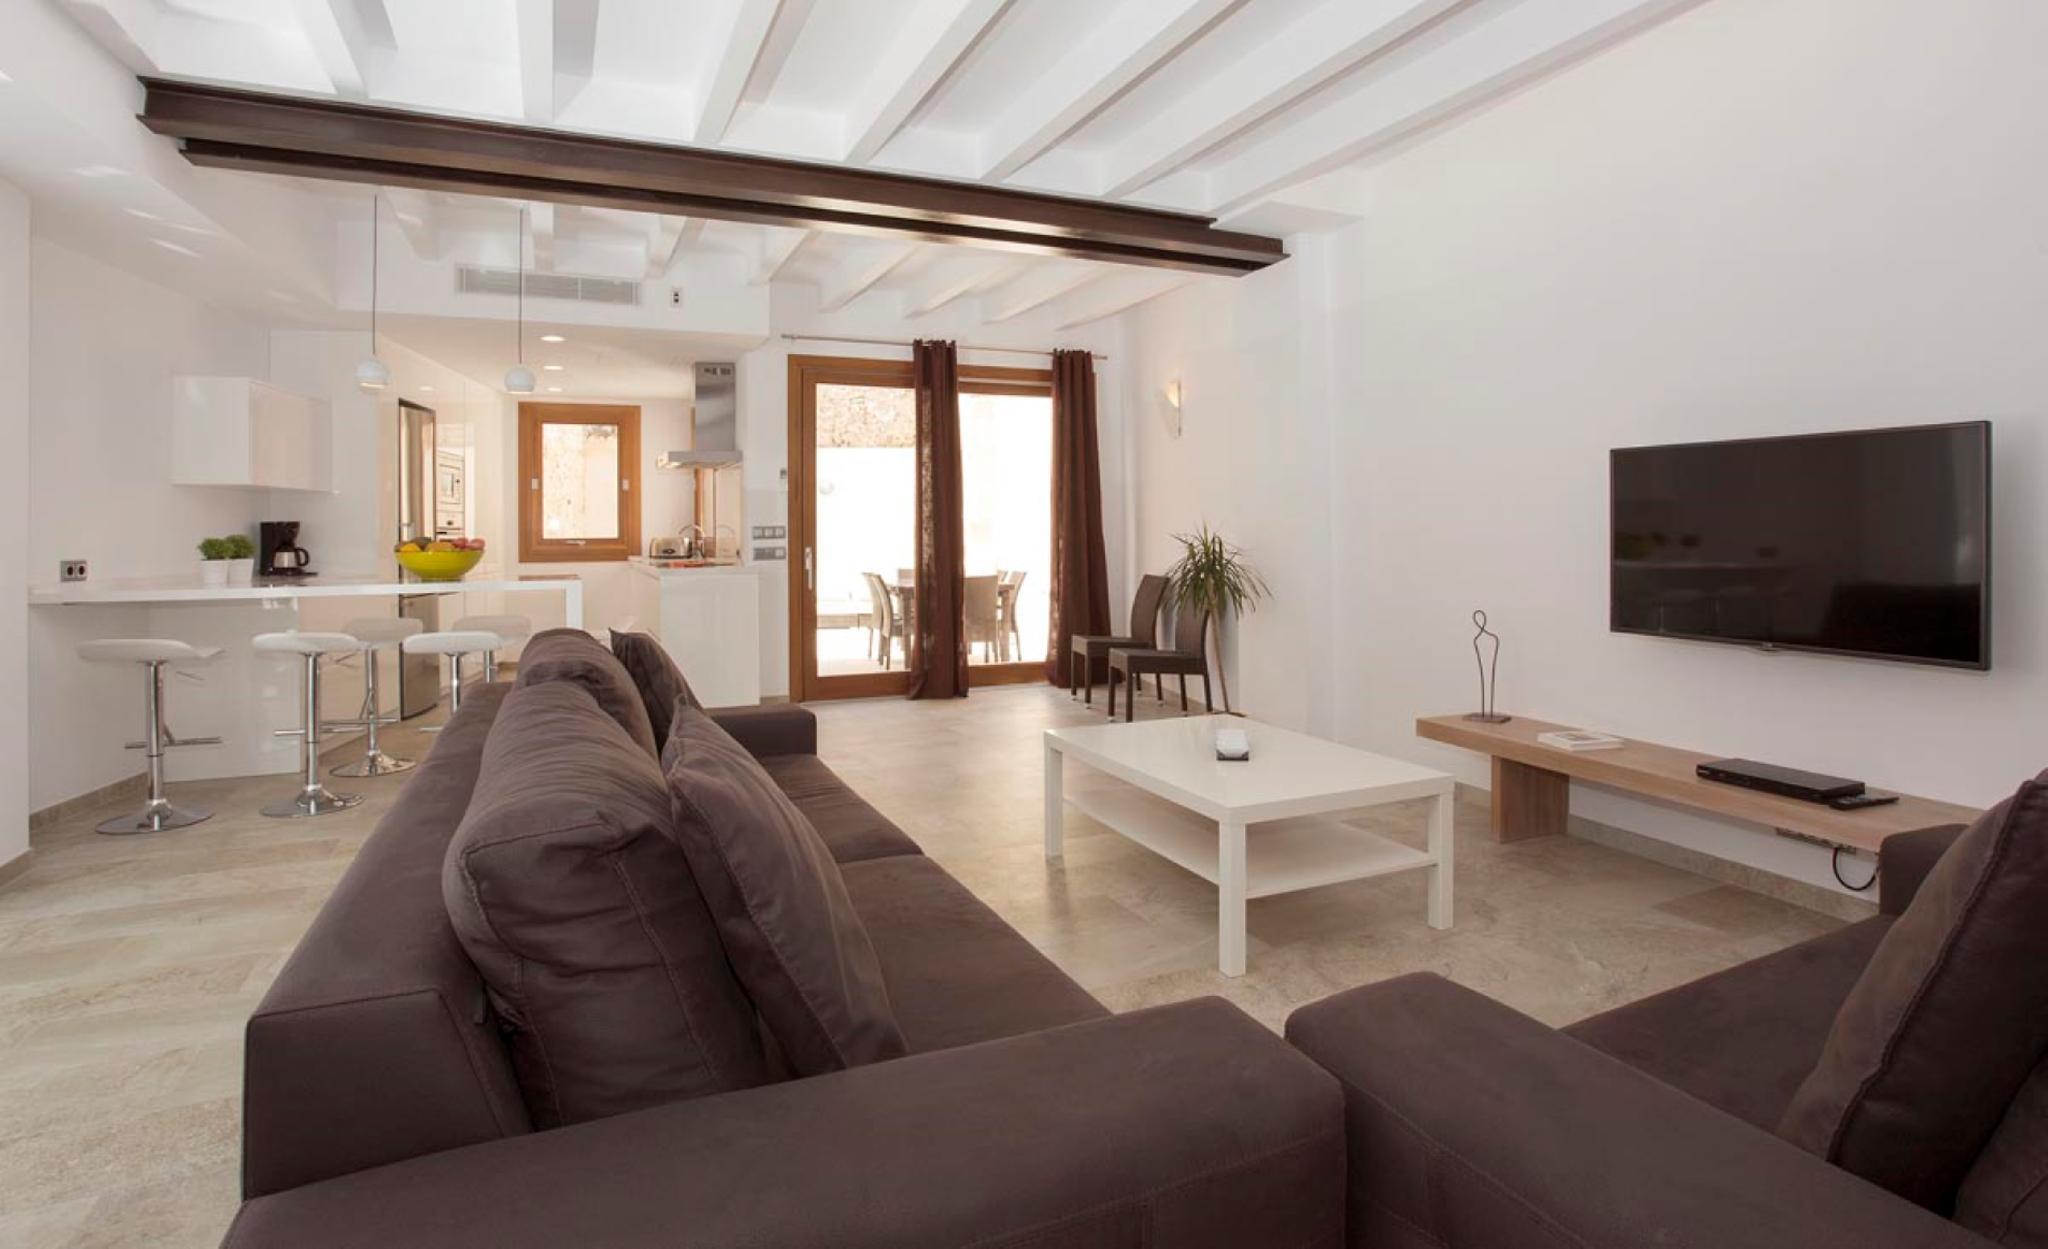 107617 - Villa in Pollensa